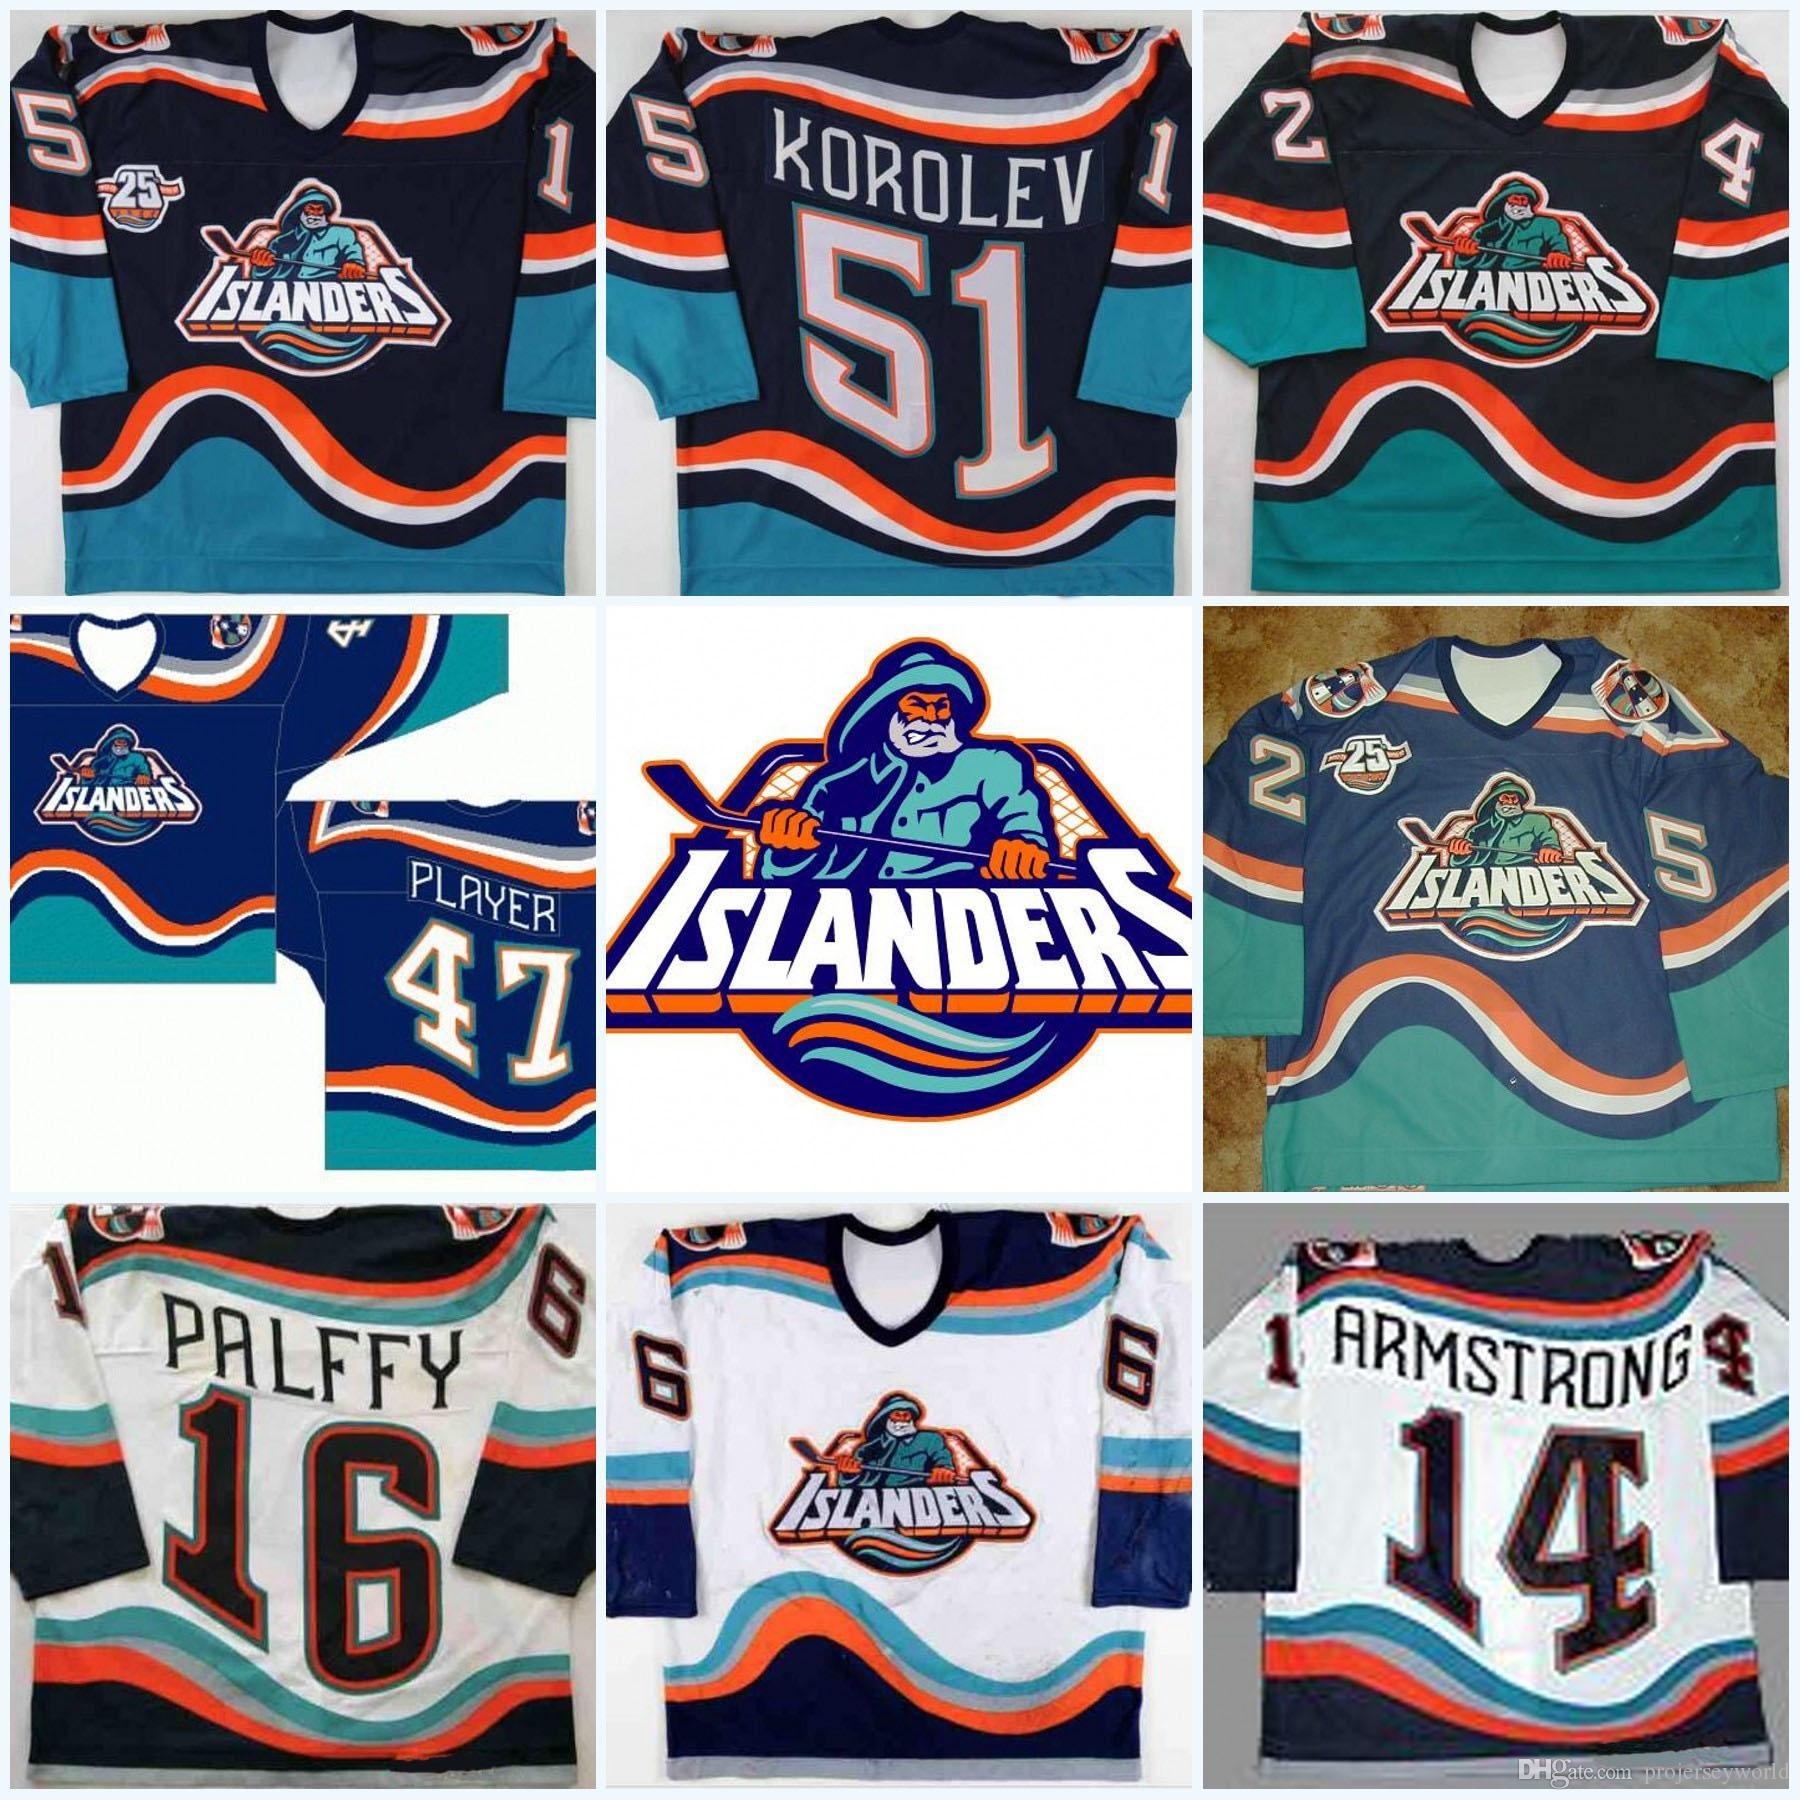 # 16 Ziggy Palffy New York Islanders Fisherman Kasparitis Johntavares Korolev Brent Severyn Berard Vintage Hockey Jerseys